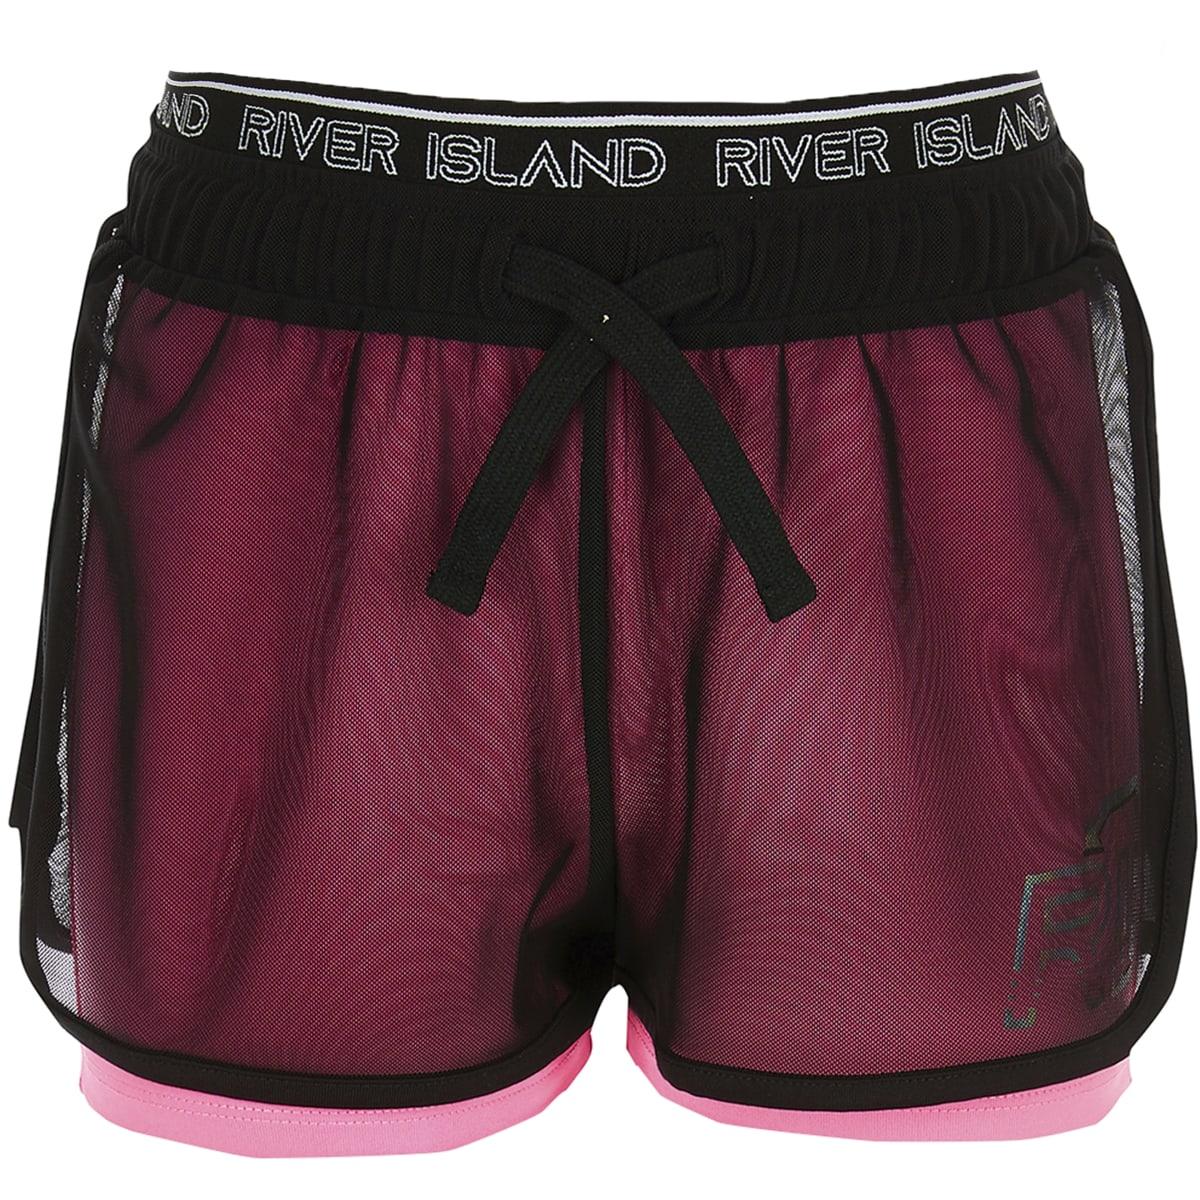 Girls RI Active pink mesh layered shorts